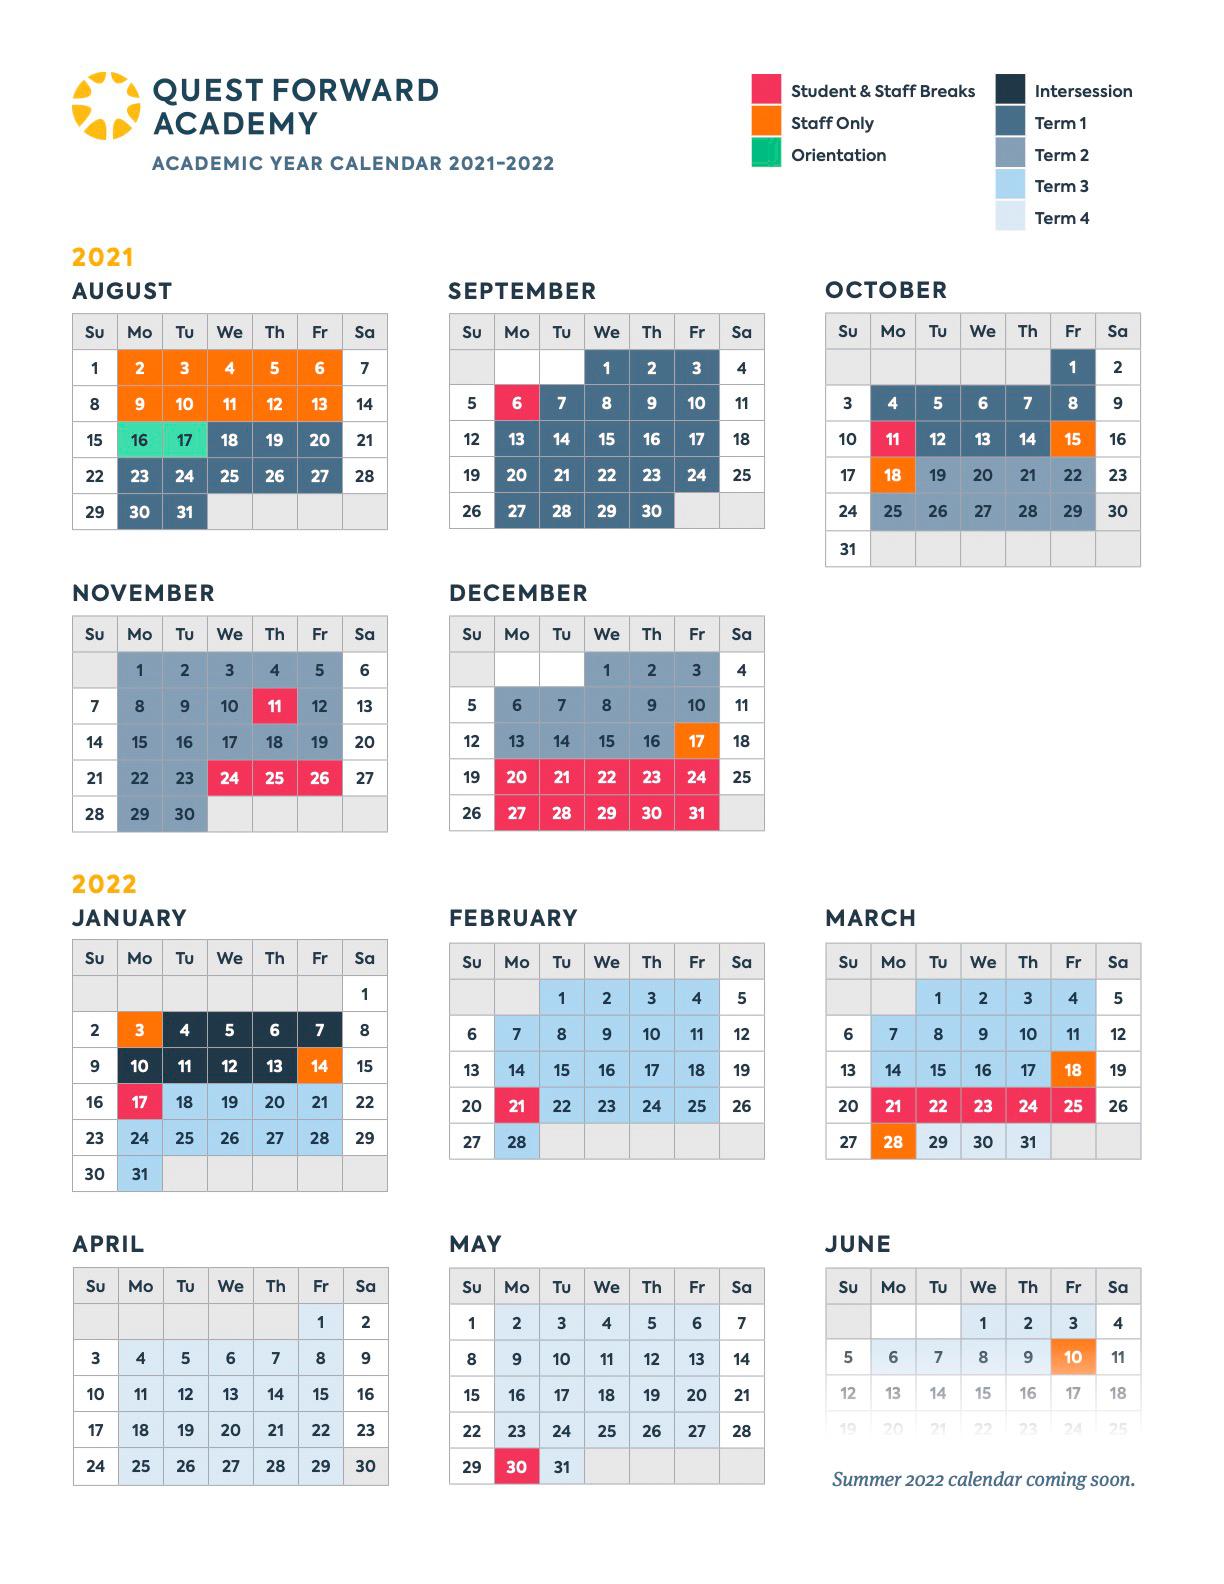 The Quest Forward Academy Academic Year Calendar for August 2021 through June 2022.